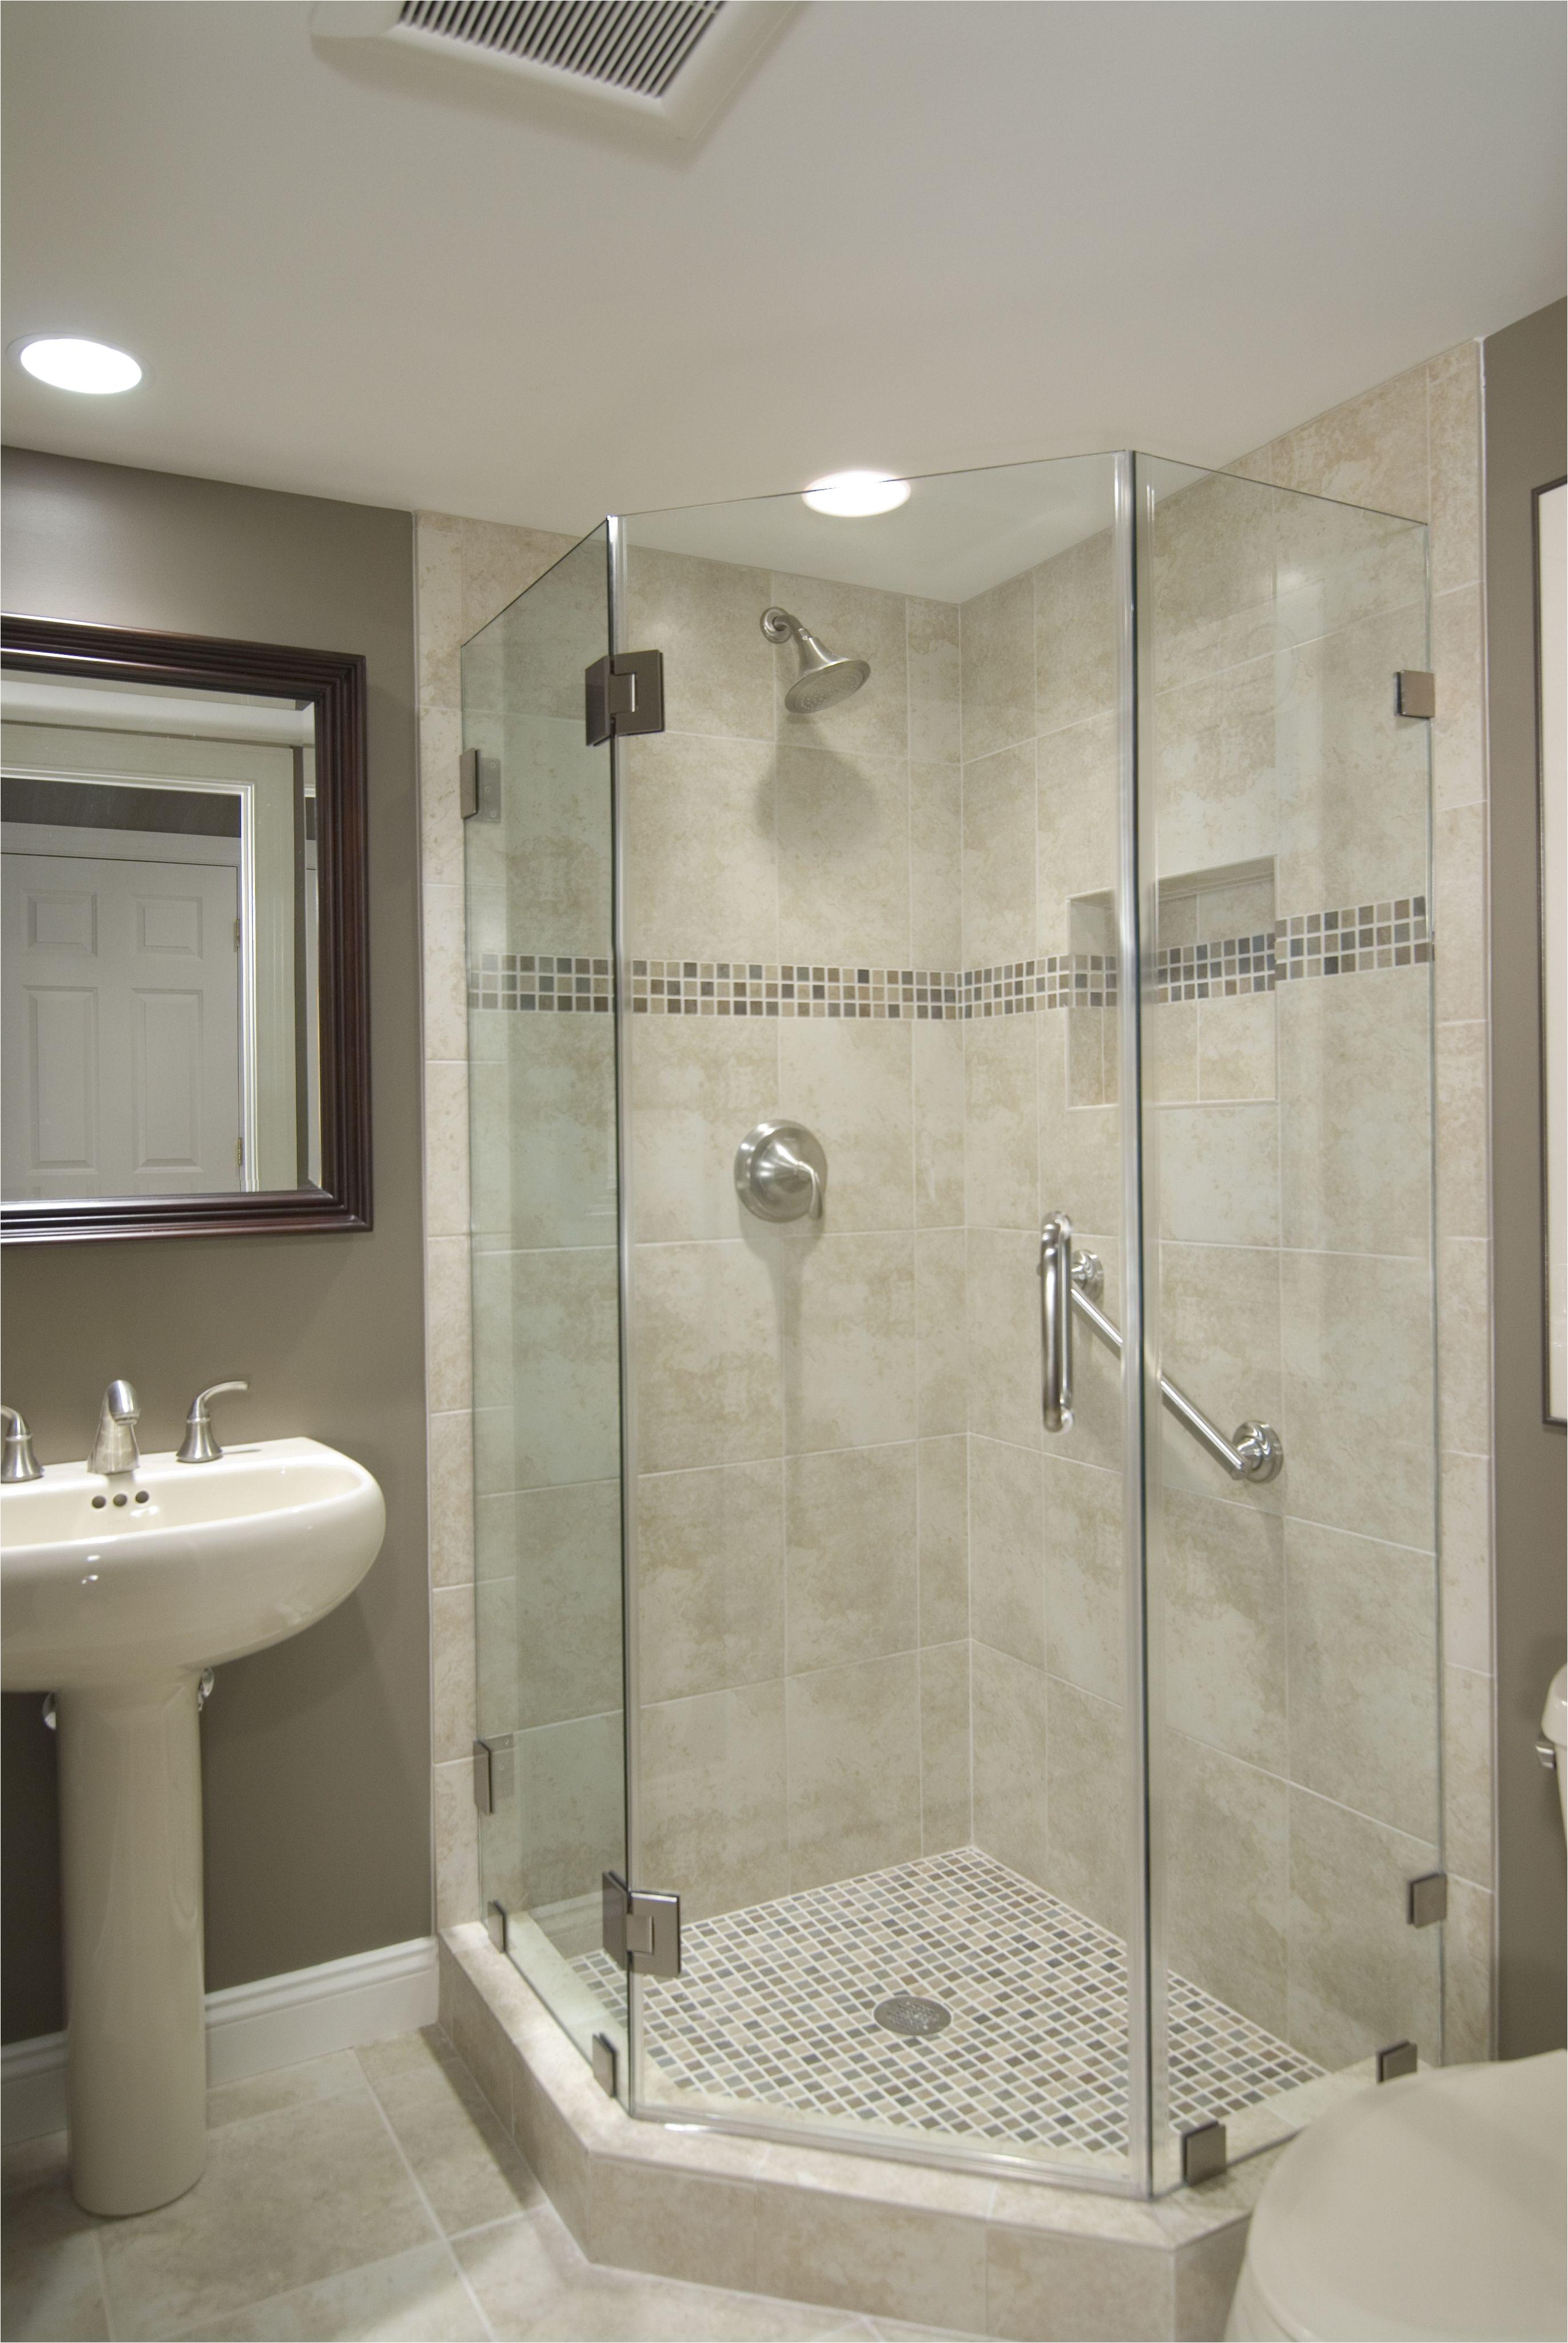 27 Basement Bathroom Ideas Shower Stalls Tags basement bathroom design ideas basement bathroom layout ideas basement bathroom lighting ideas